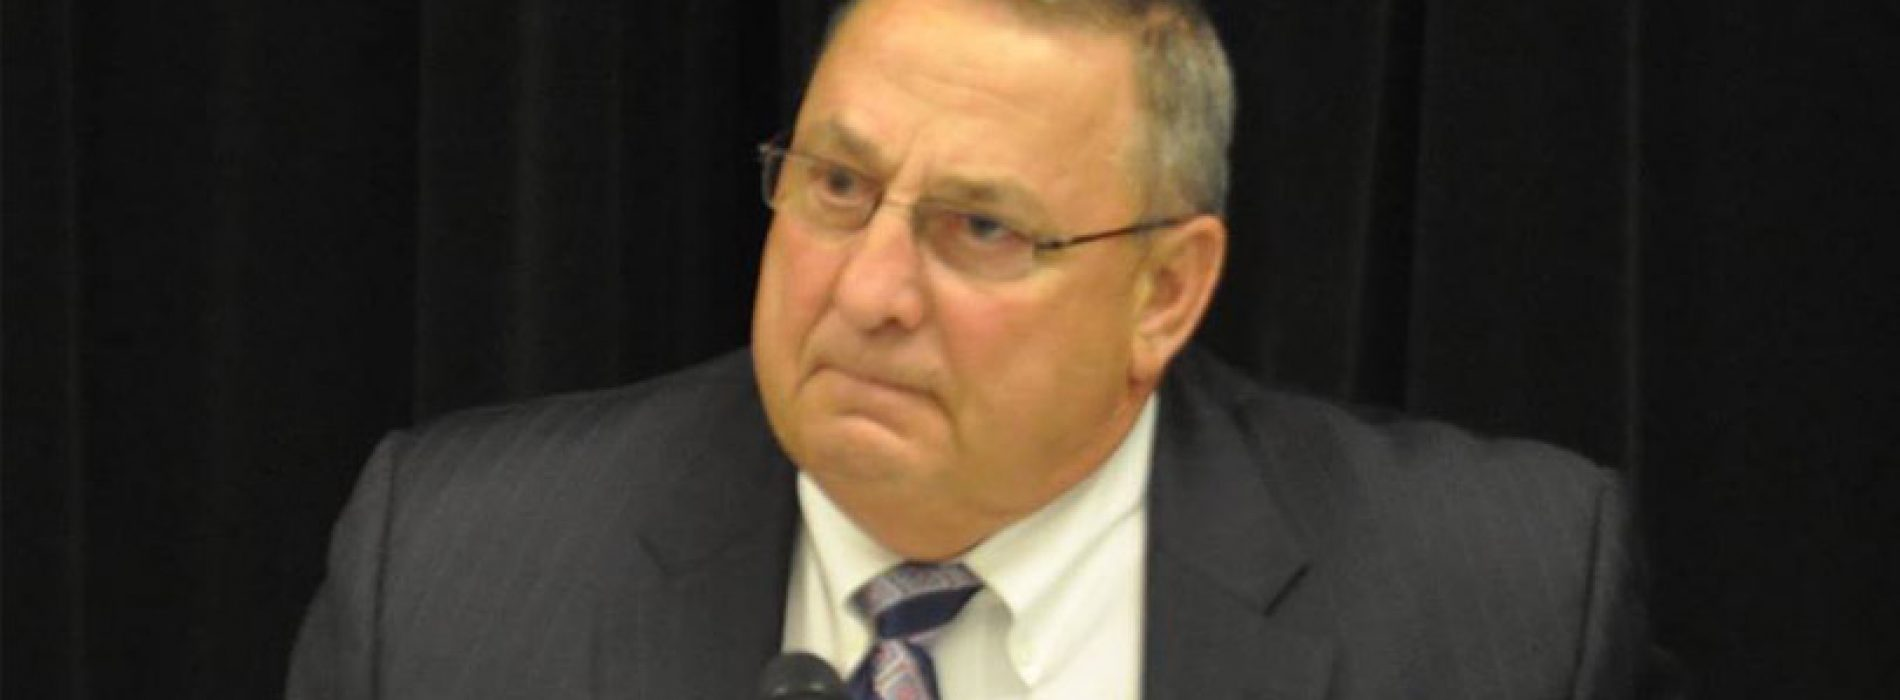 Gov. LePage's latest lie shows he hasn't read minimum wage law